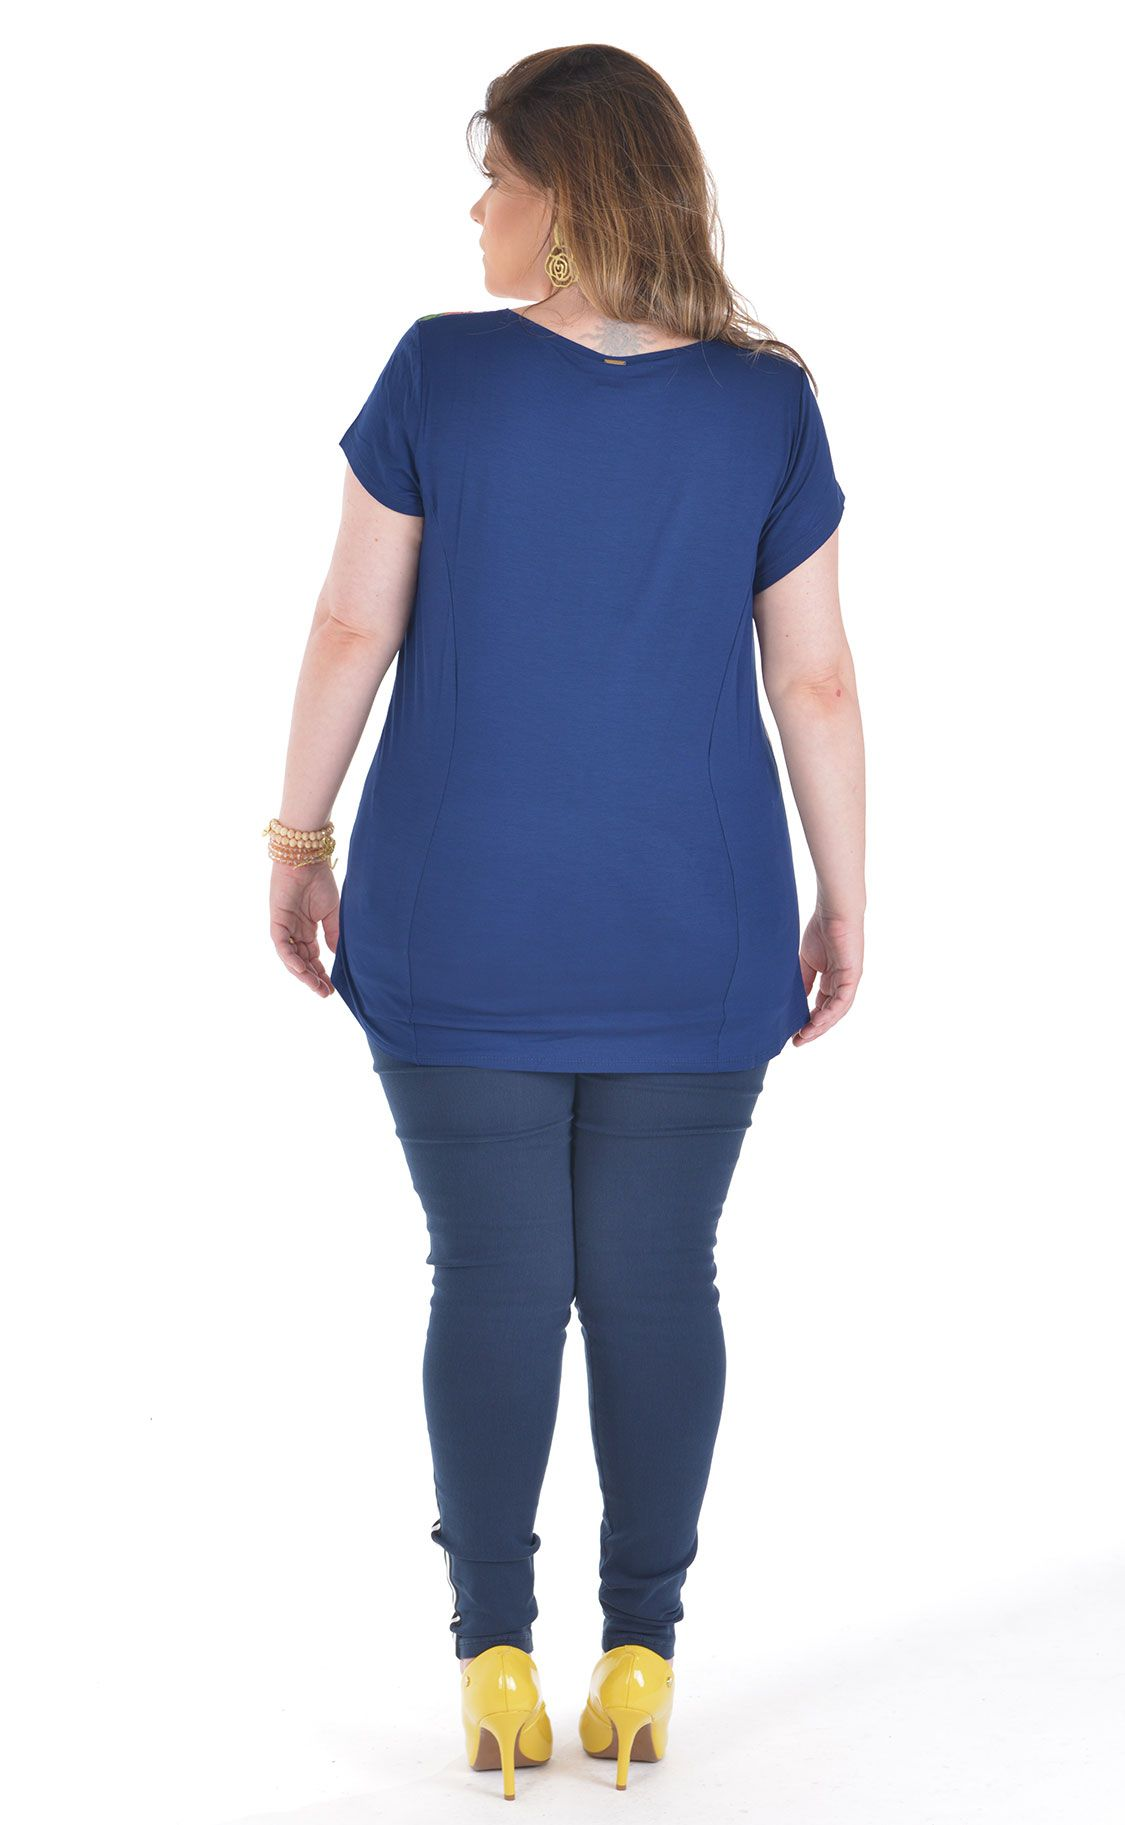 Camiseta Plus Size Limits